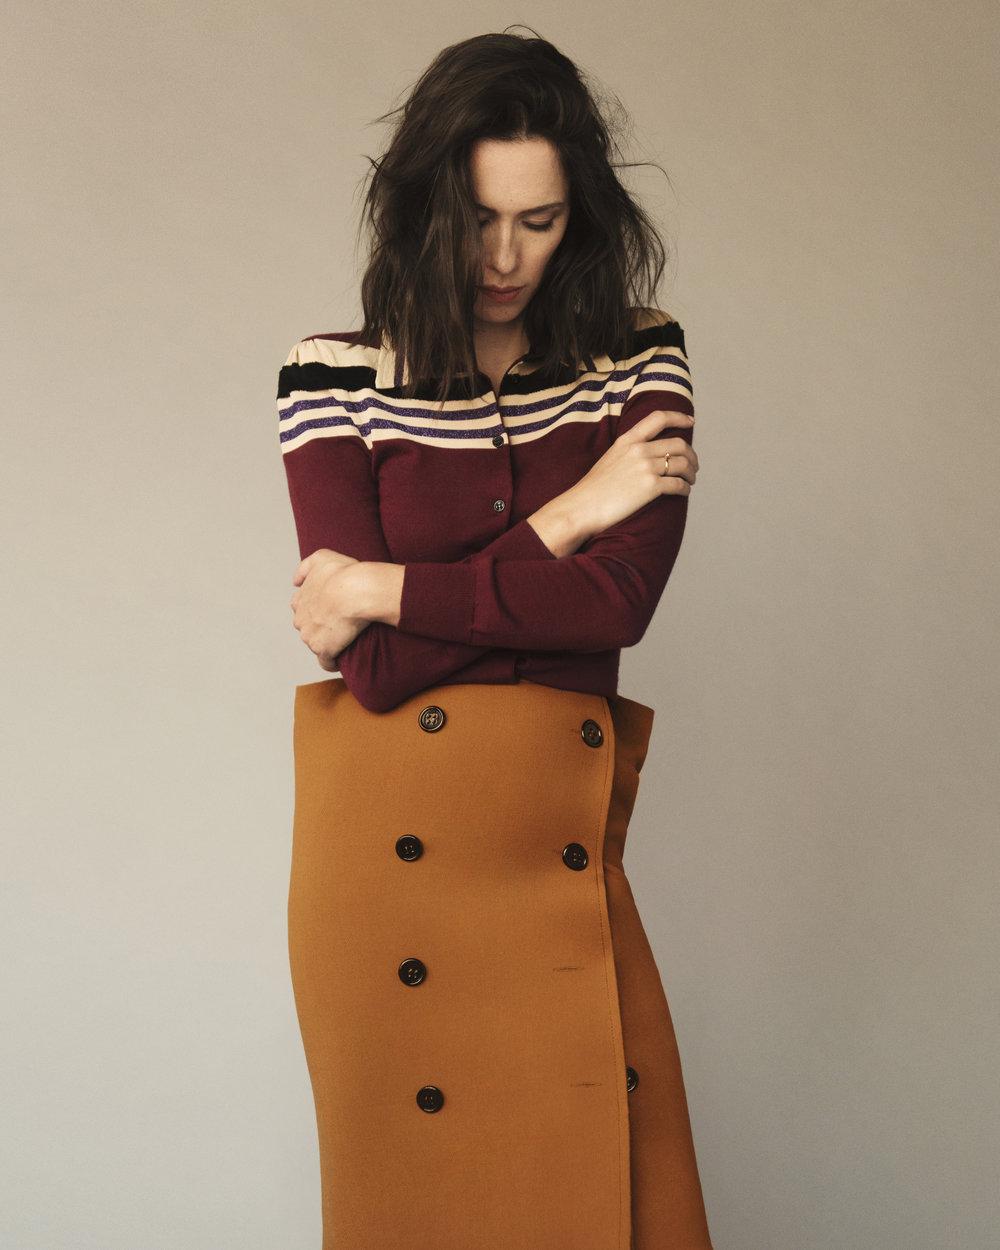 Sweater in barolo striped wool and skirt in dark leather new wool natte by BOTTEGA VENETAFall/Winter 2017